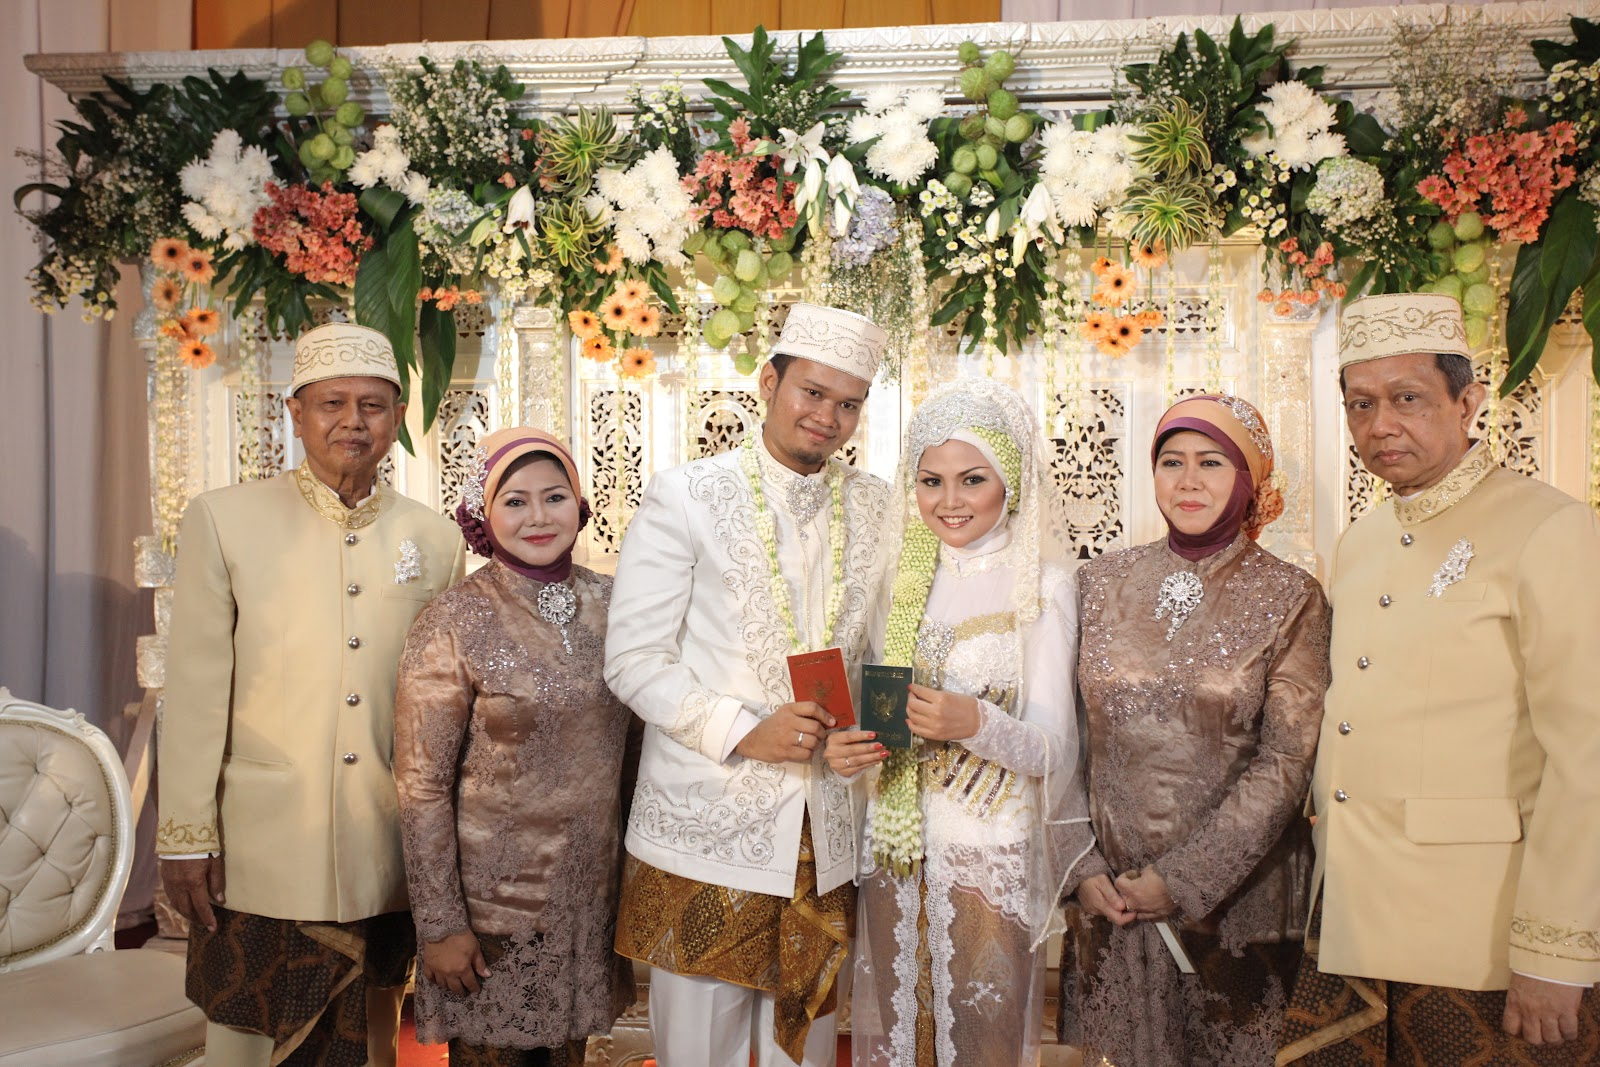 Gaun Pengantin Orang Tua Inspirasi Pernikahan